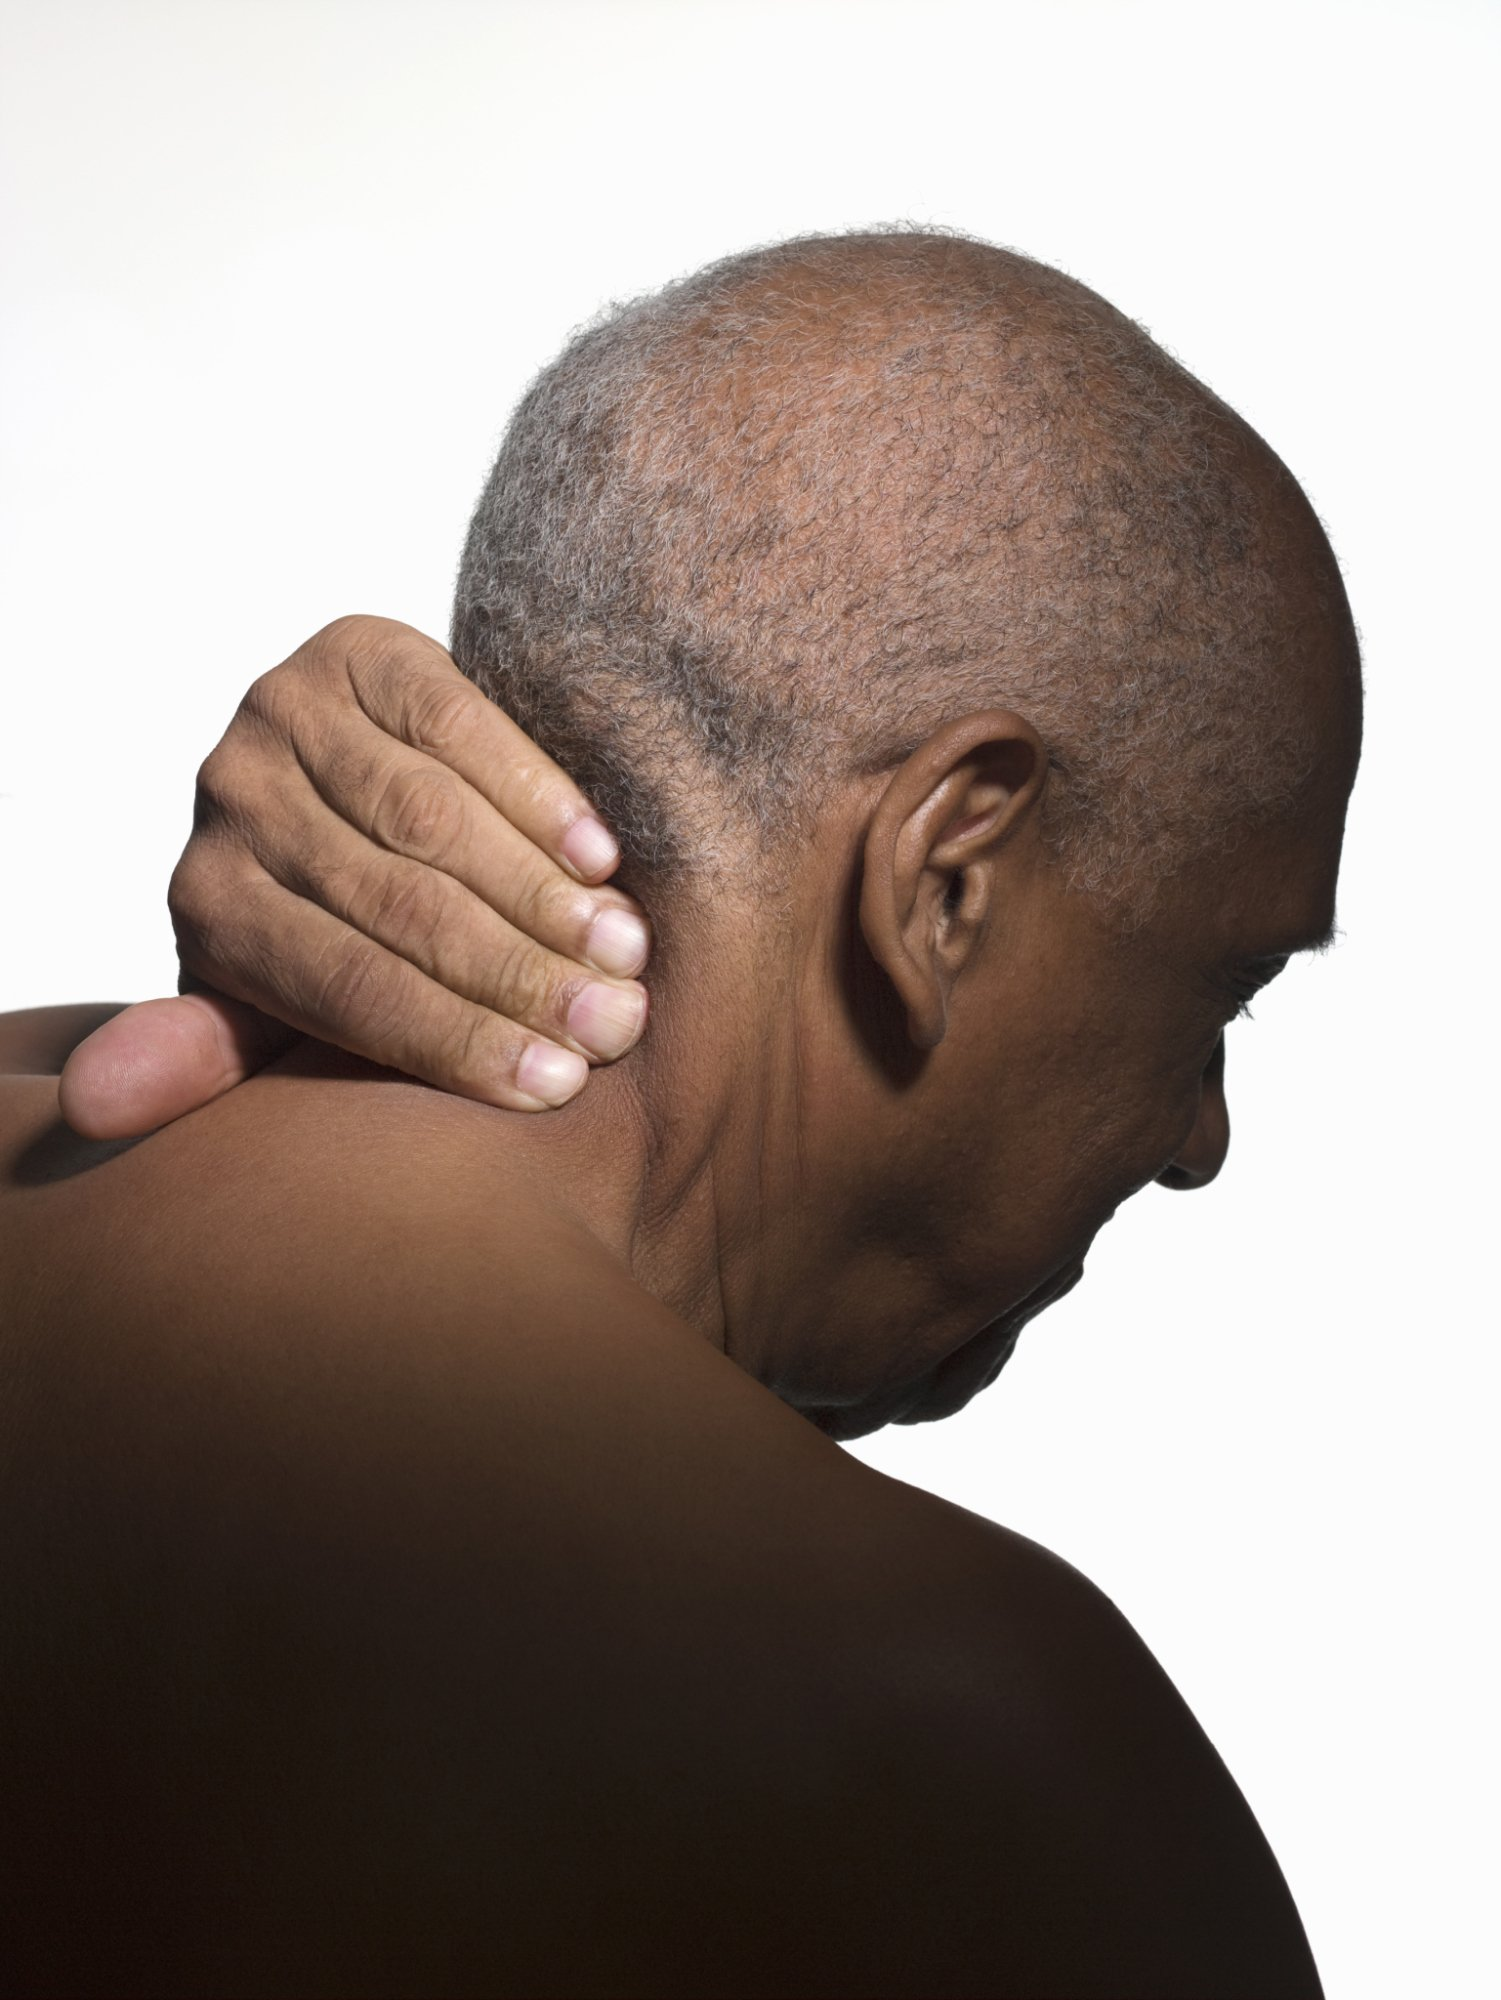 old man neck pain body massage